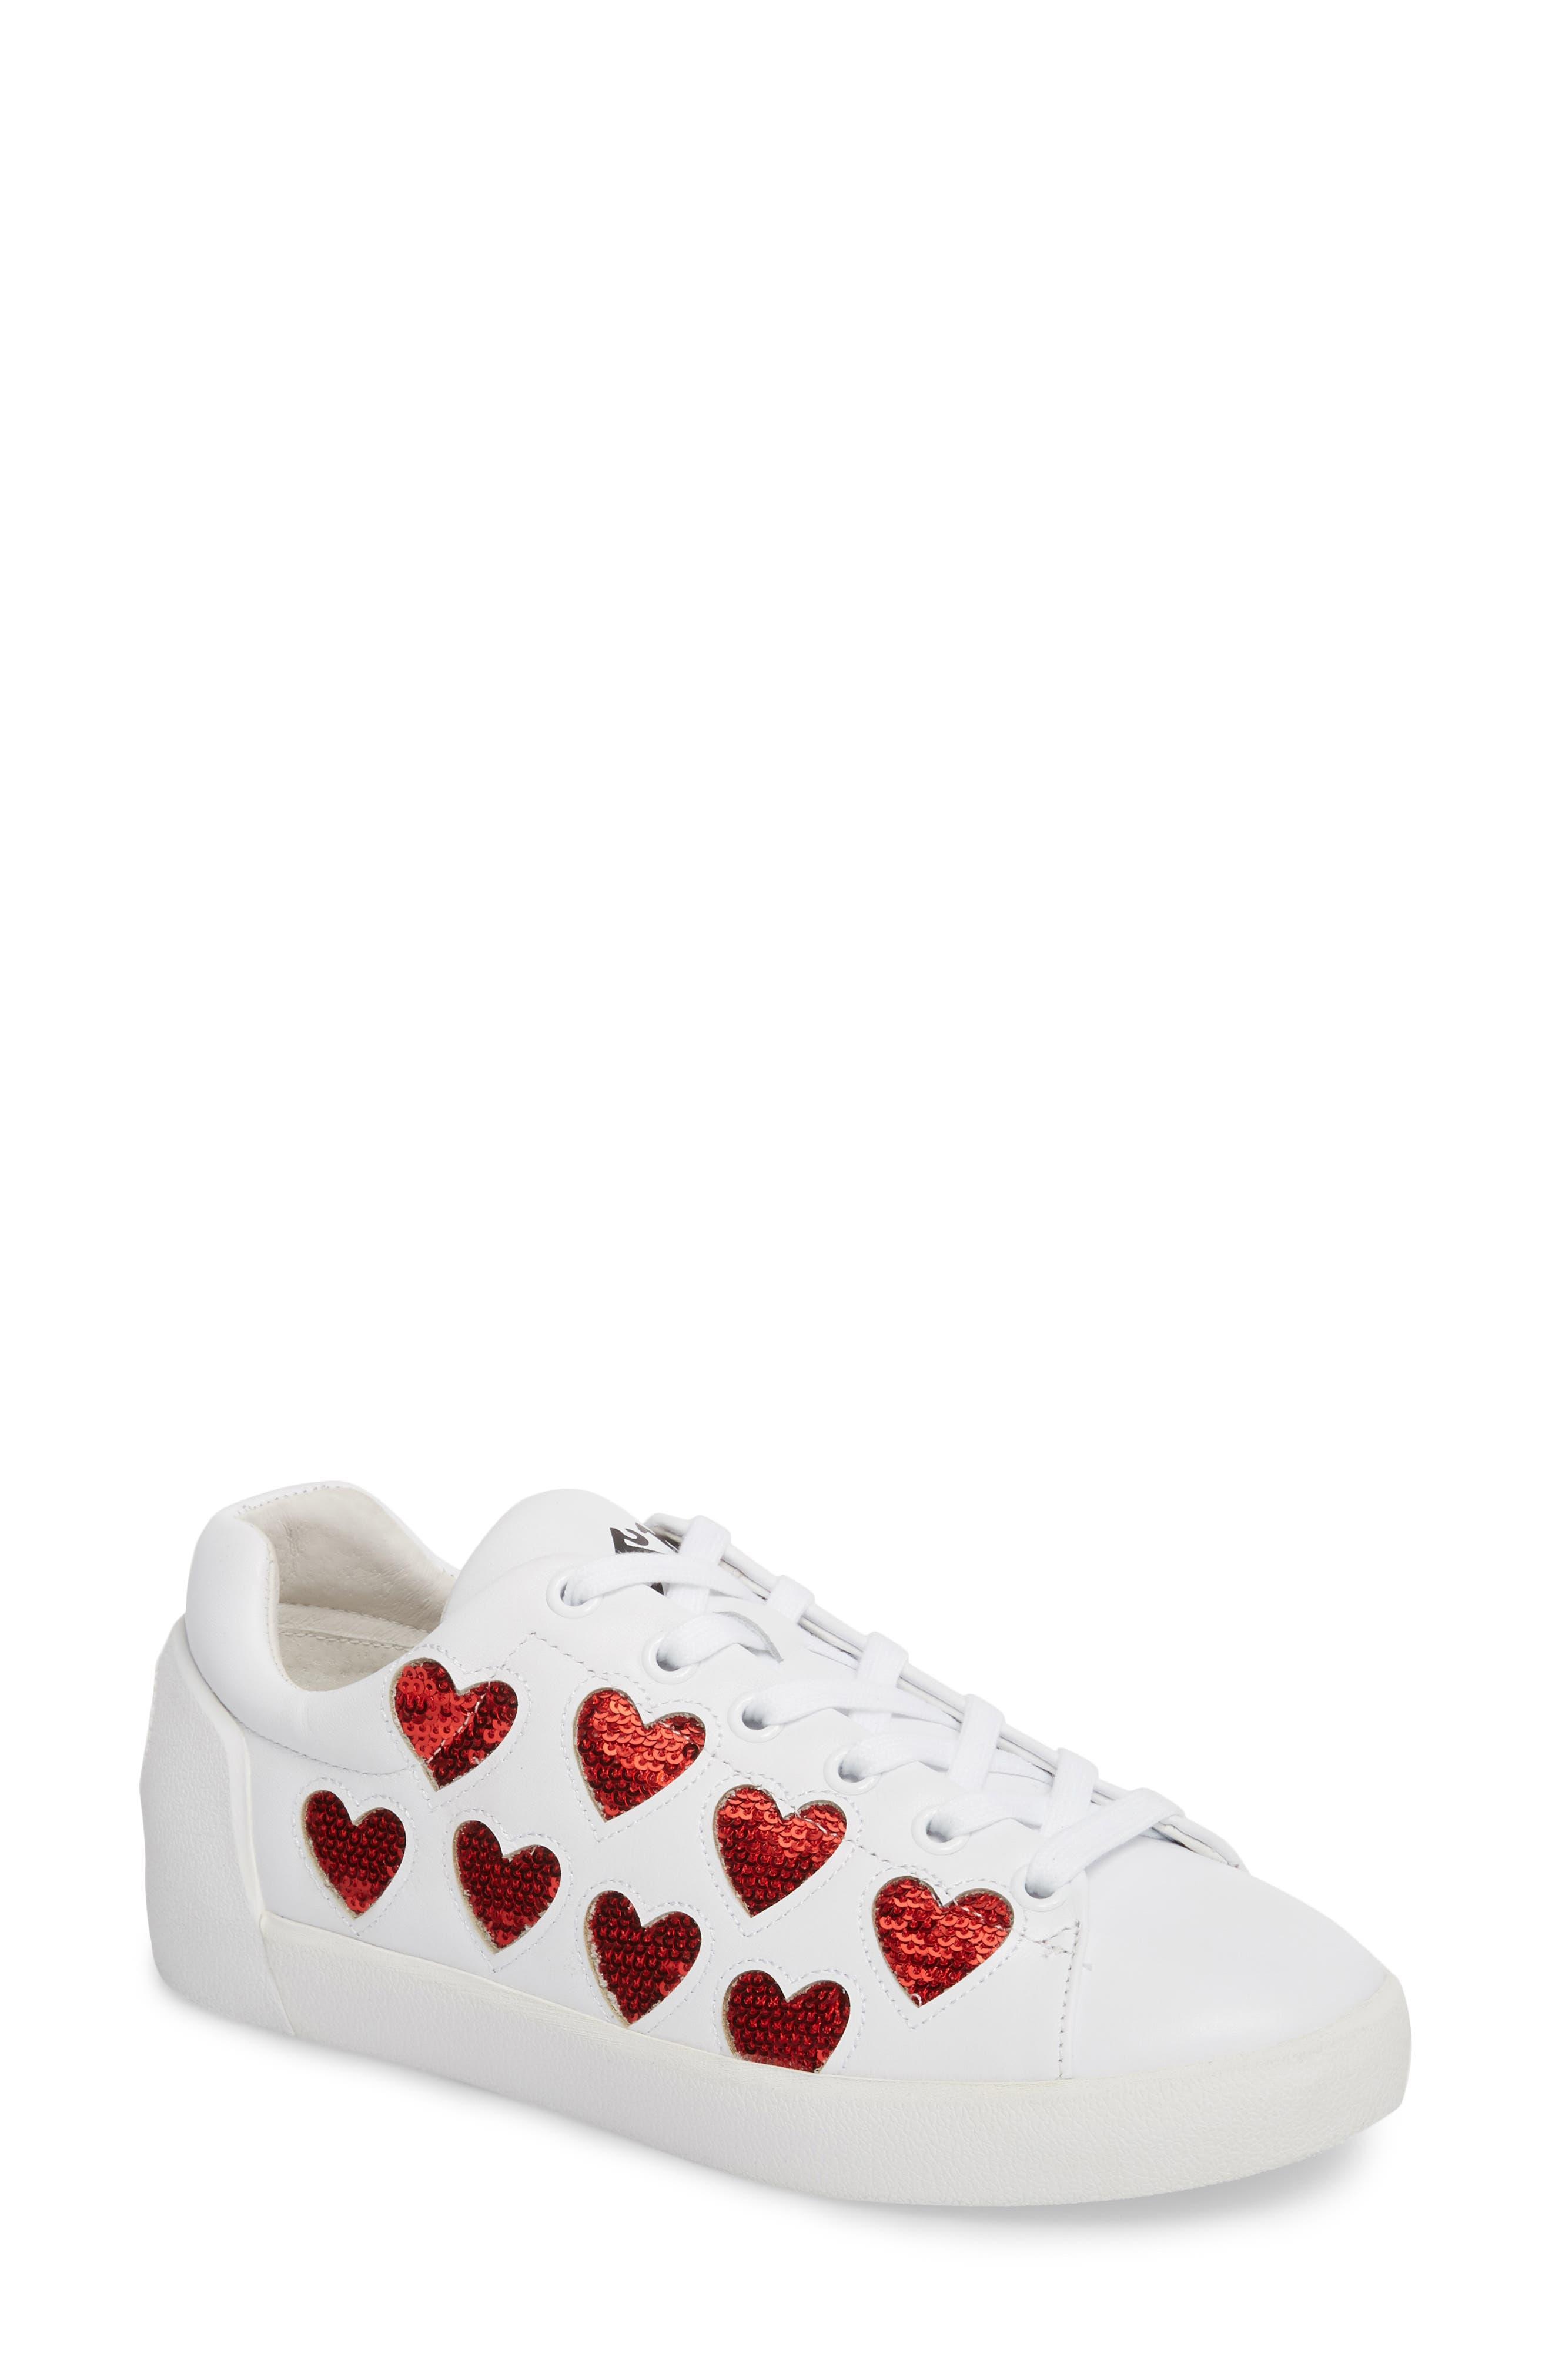 Nikita Sneaker,                             Main thumbnail 1, color,                             White/ Red